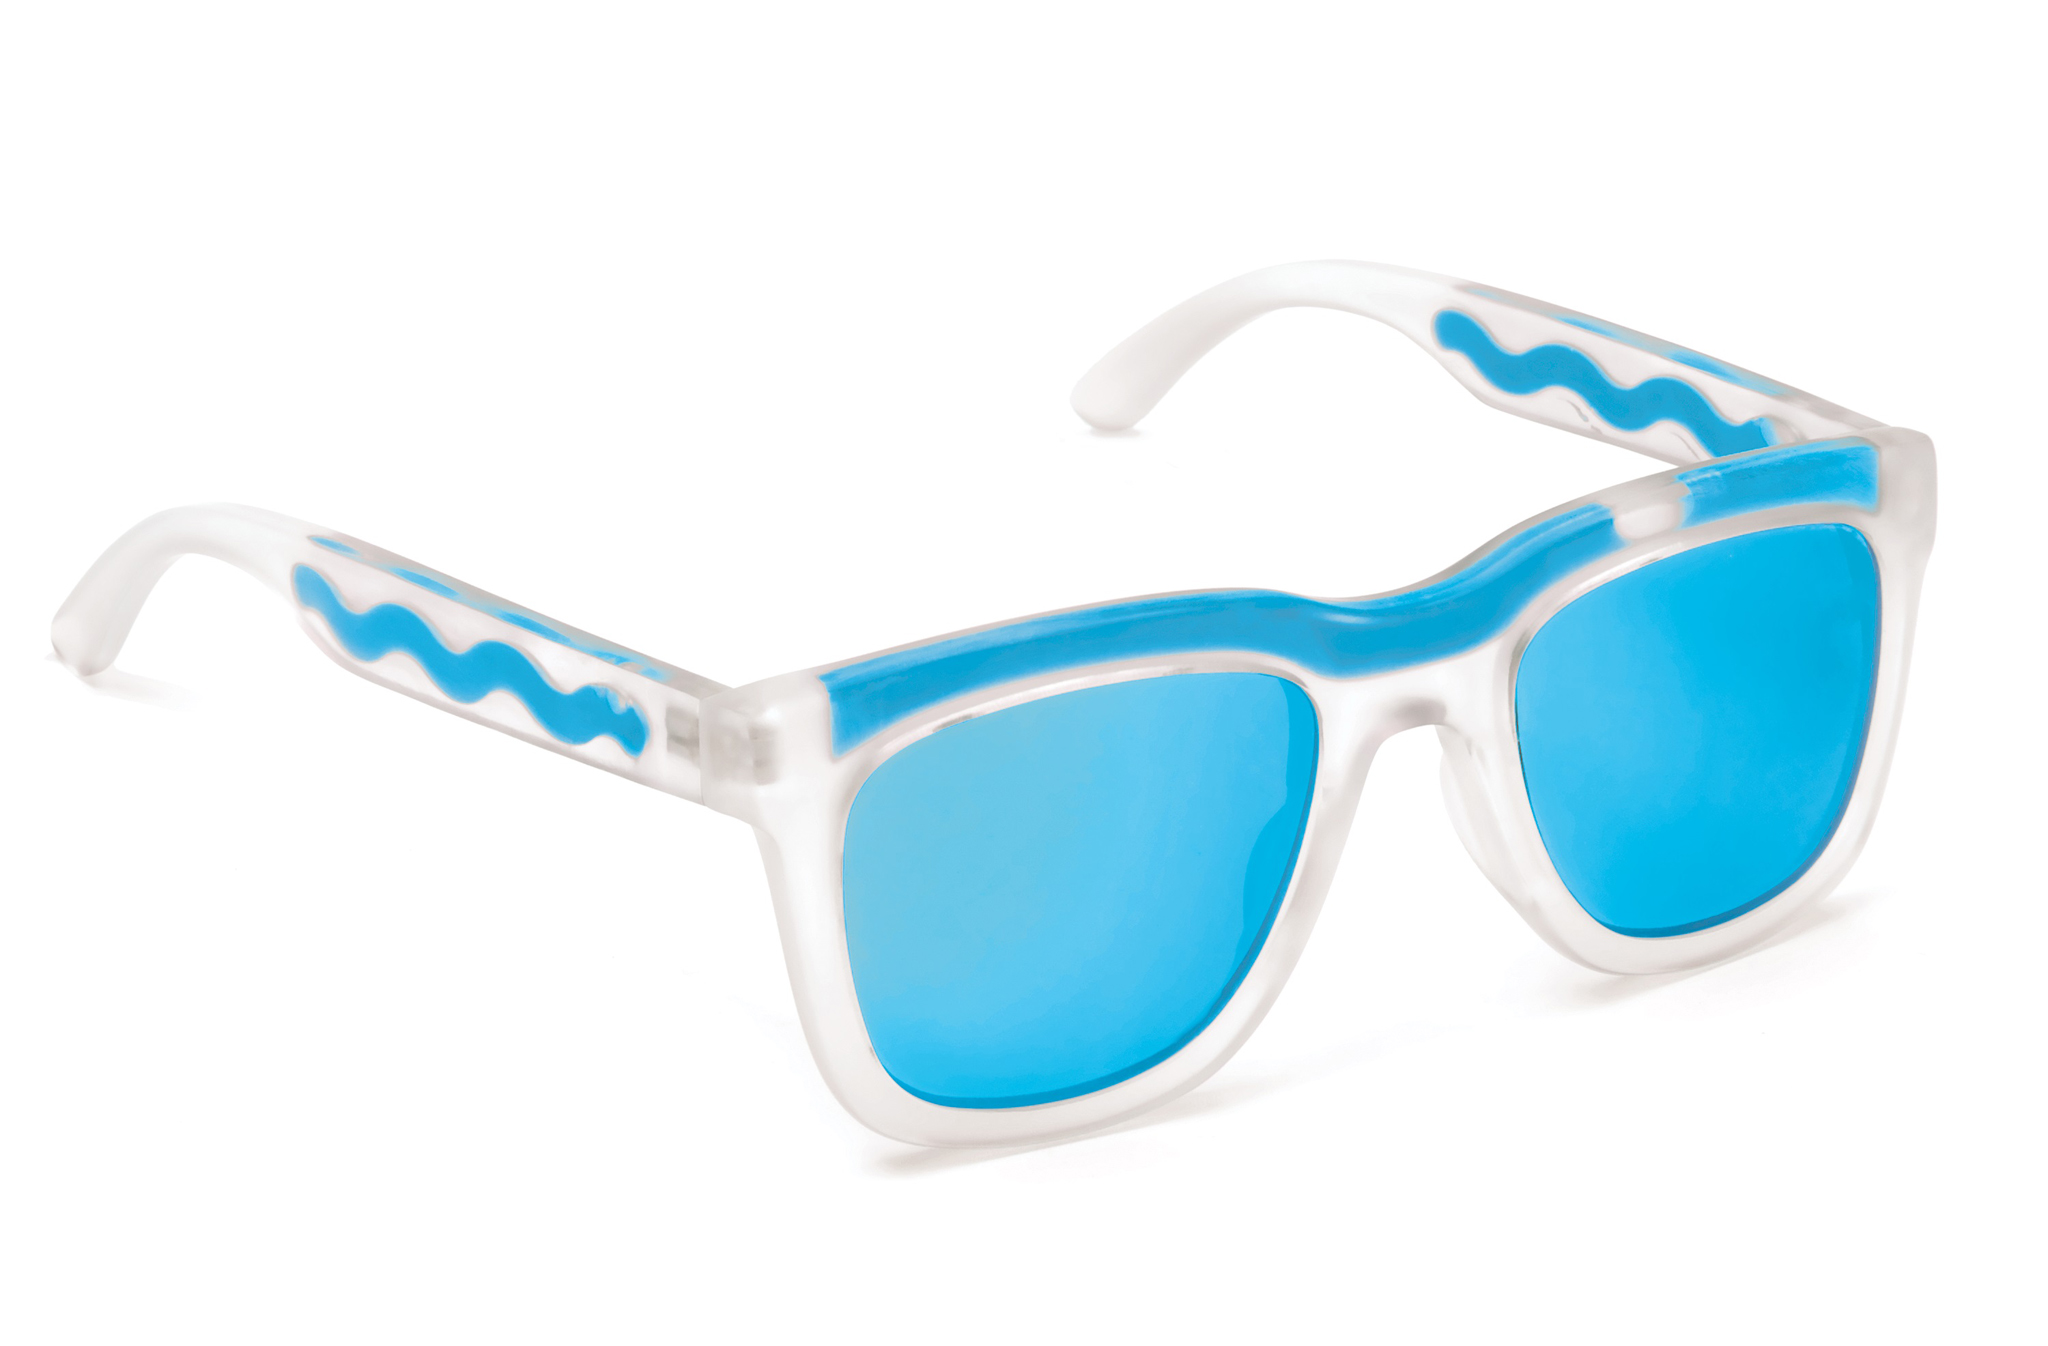 Jeremy Scott x Italia Independent sunglasses